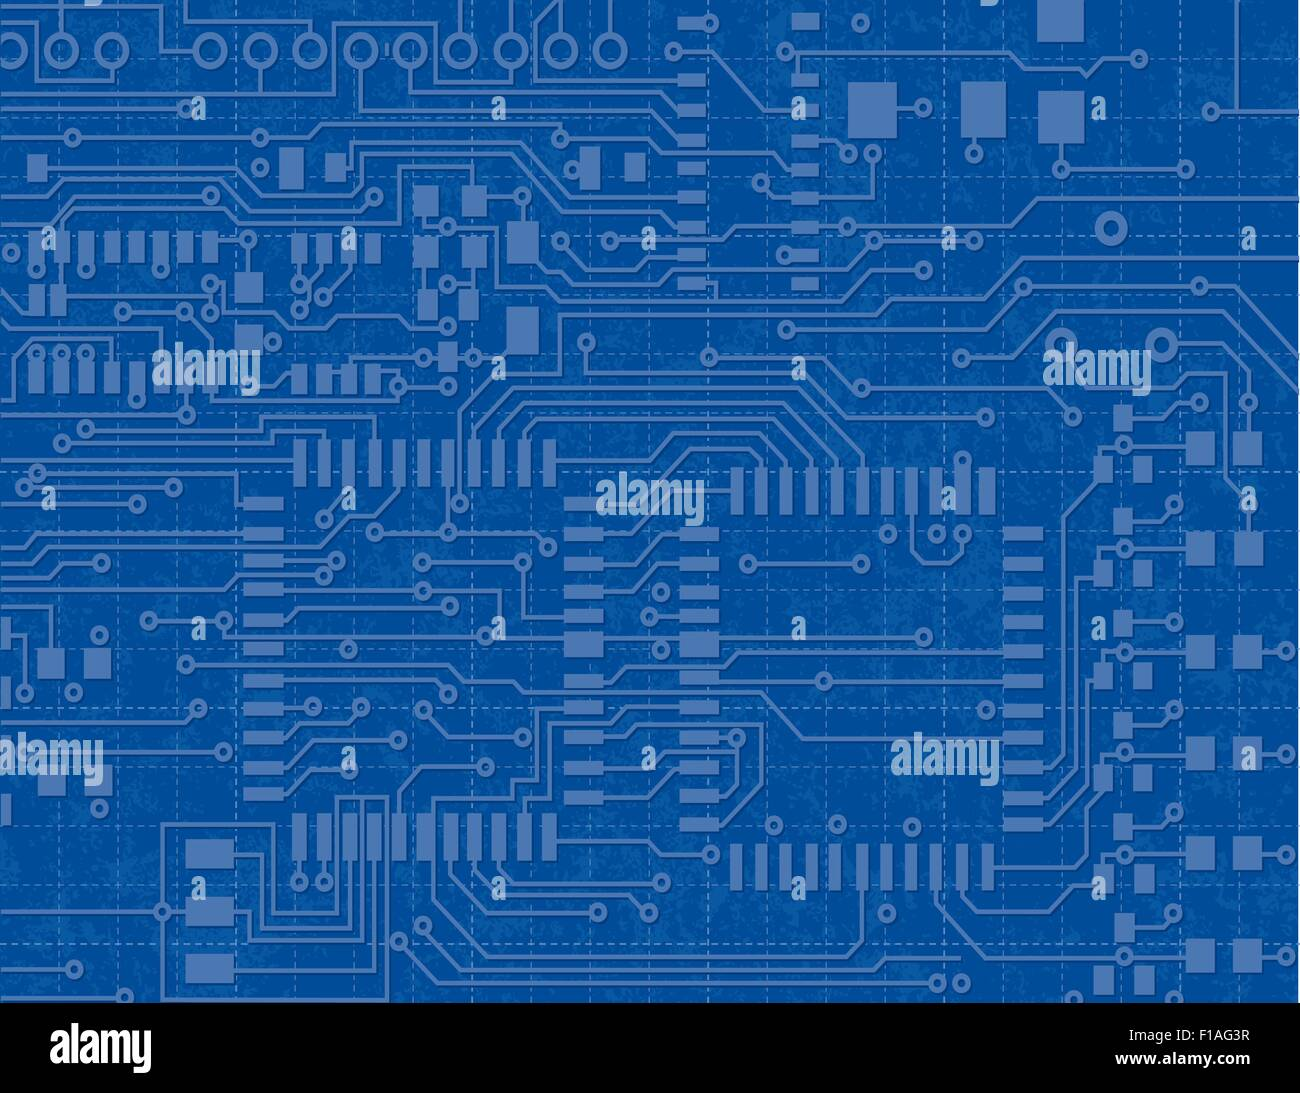 Circuit Board Blueprint Stockfotos & Circuit Board Blueprint Bilder ...